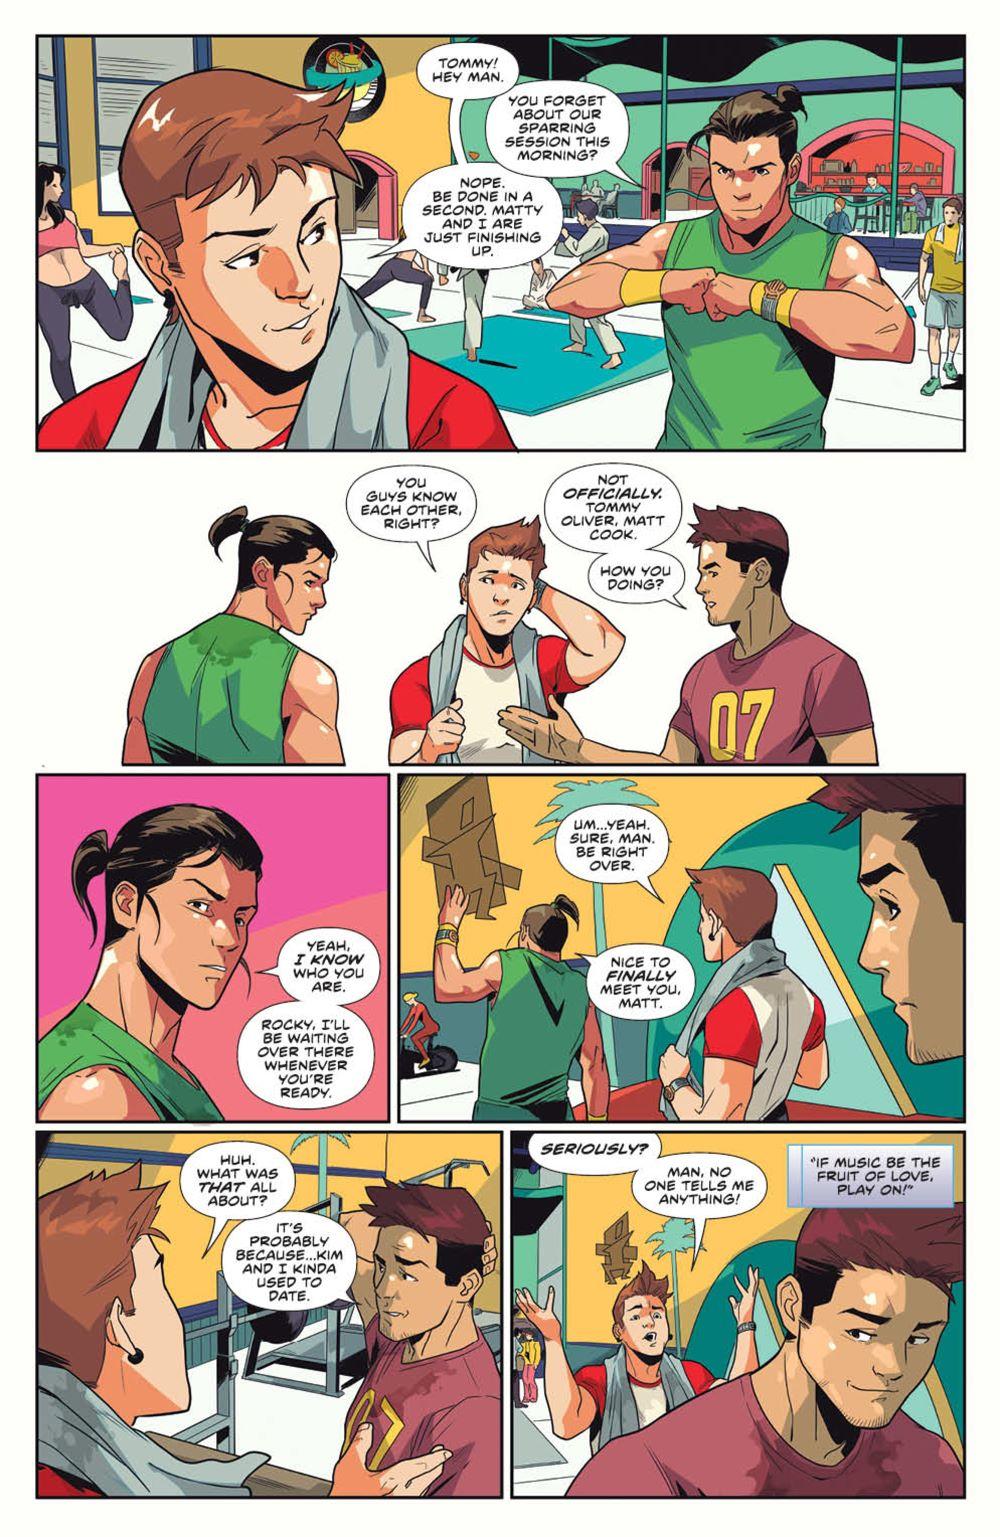 MightyMorphin_v1_SC_PRESS_18 ComicList Previews: MIGHTY MORPHIN VOLUME 1 TP